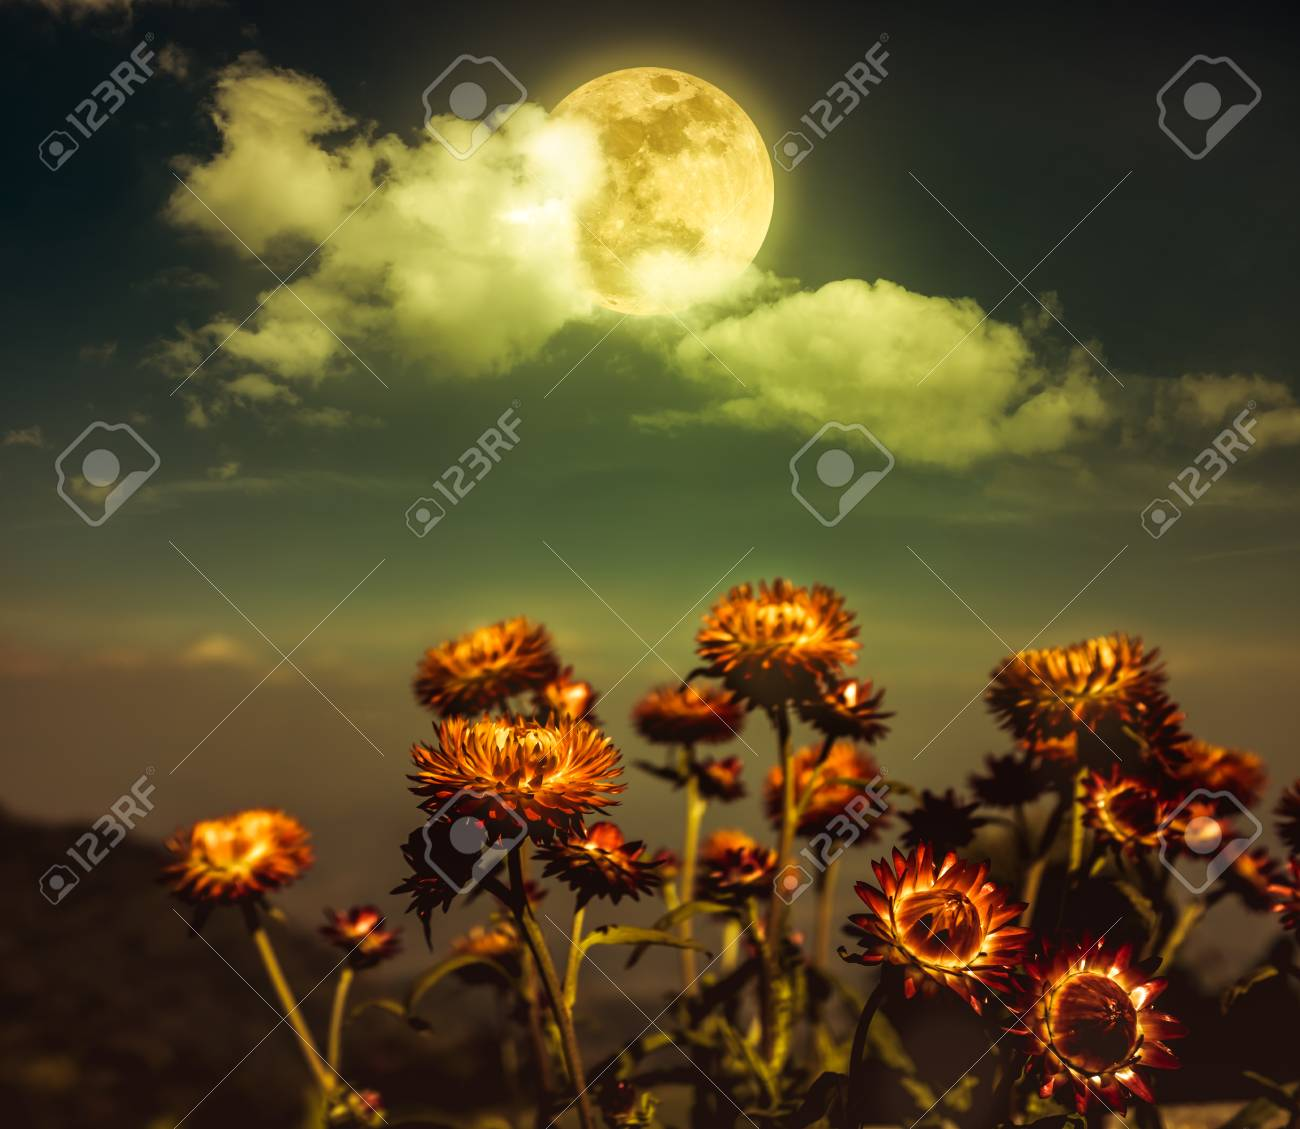 Beautiful night landscape of sky with full moon behind clouds beautiful night landscape of sky with full moon behind clouds above dry straw flowers serenity izmirmasajfo